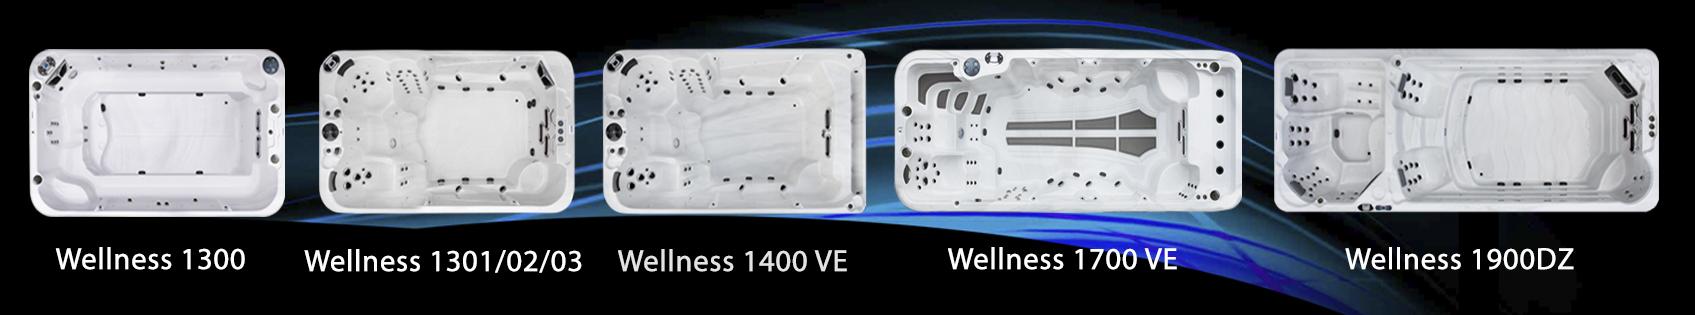 Wellness Serie